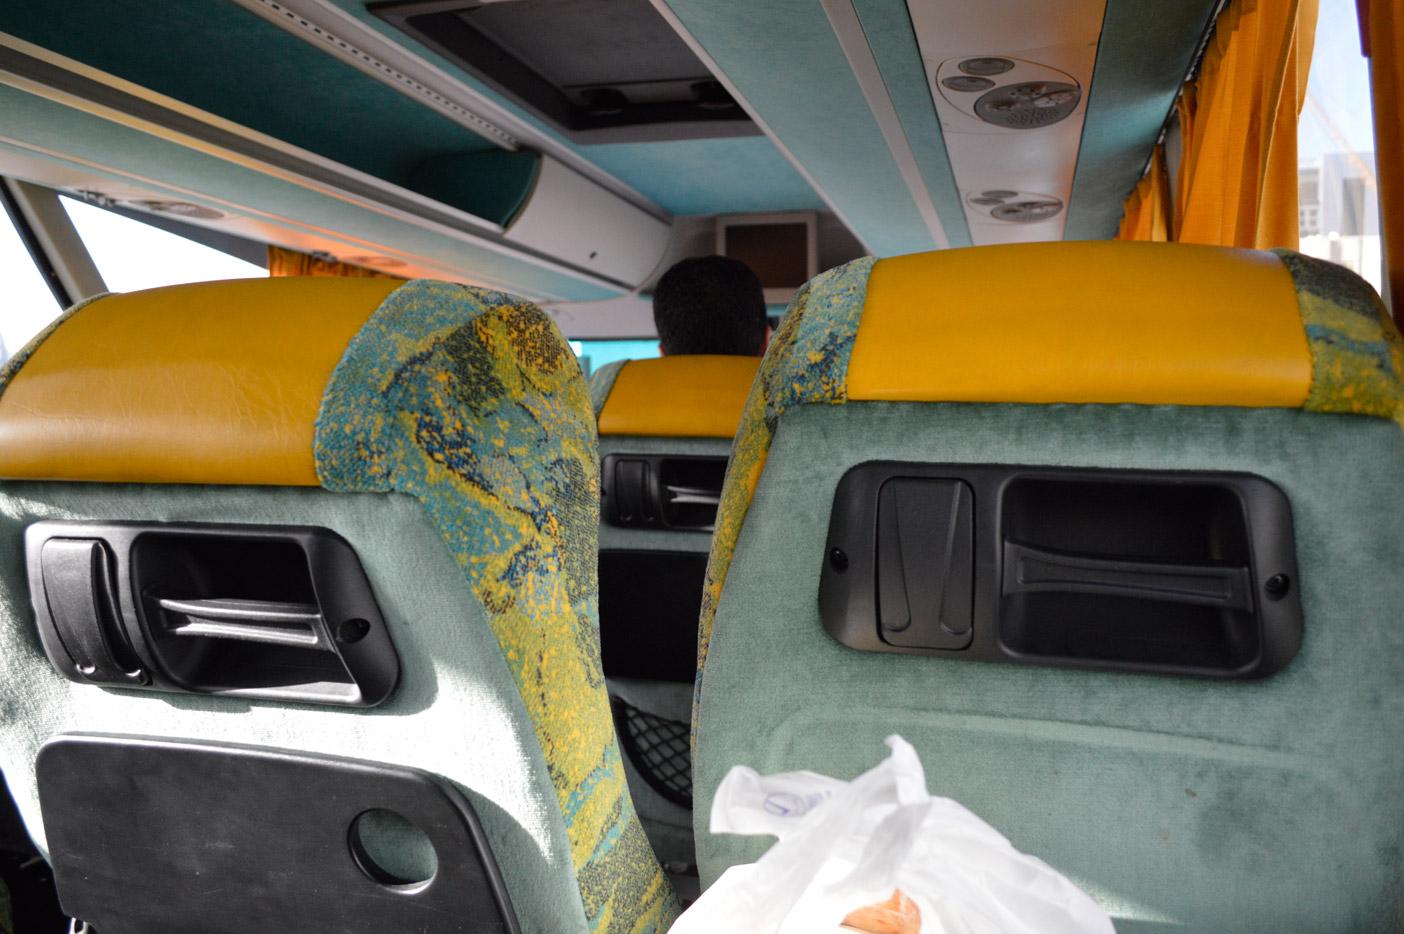 UAE(ドバイ)オマーン(マスカット)間の陸路移動。国際バス乗車